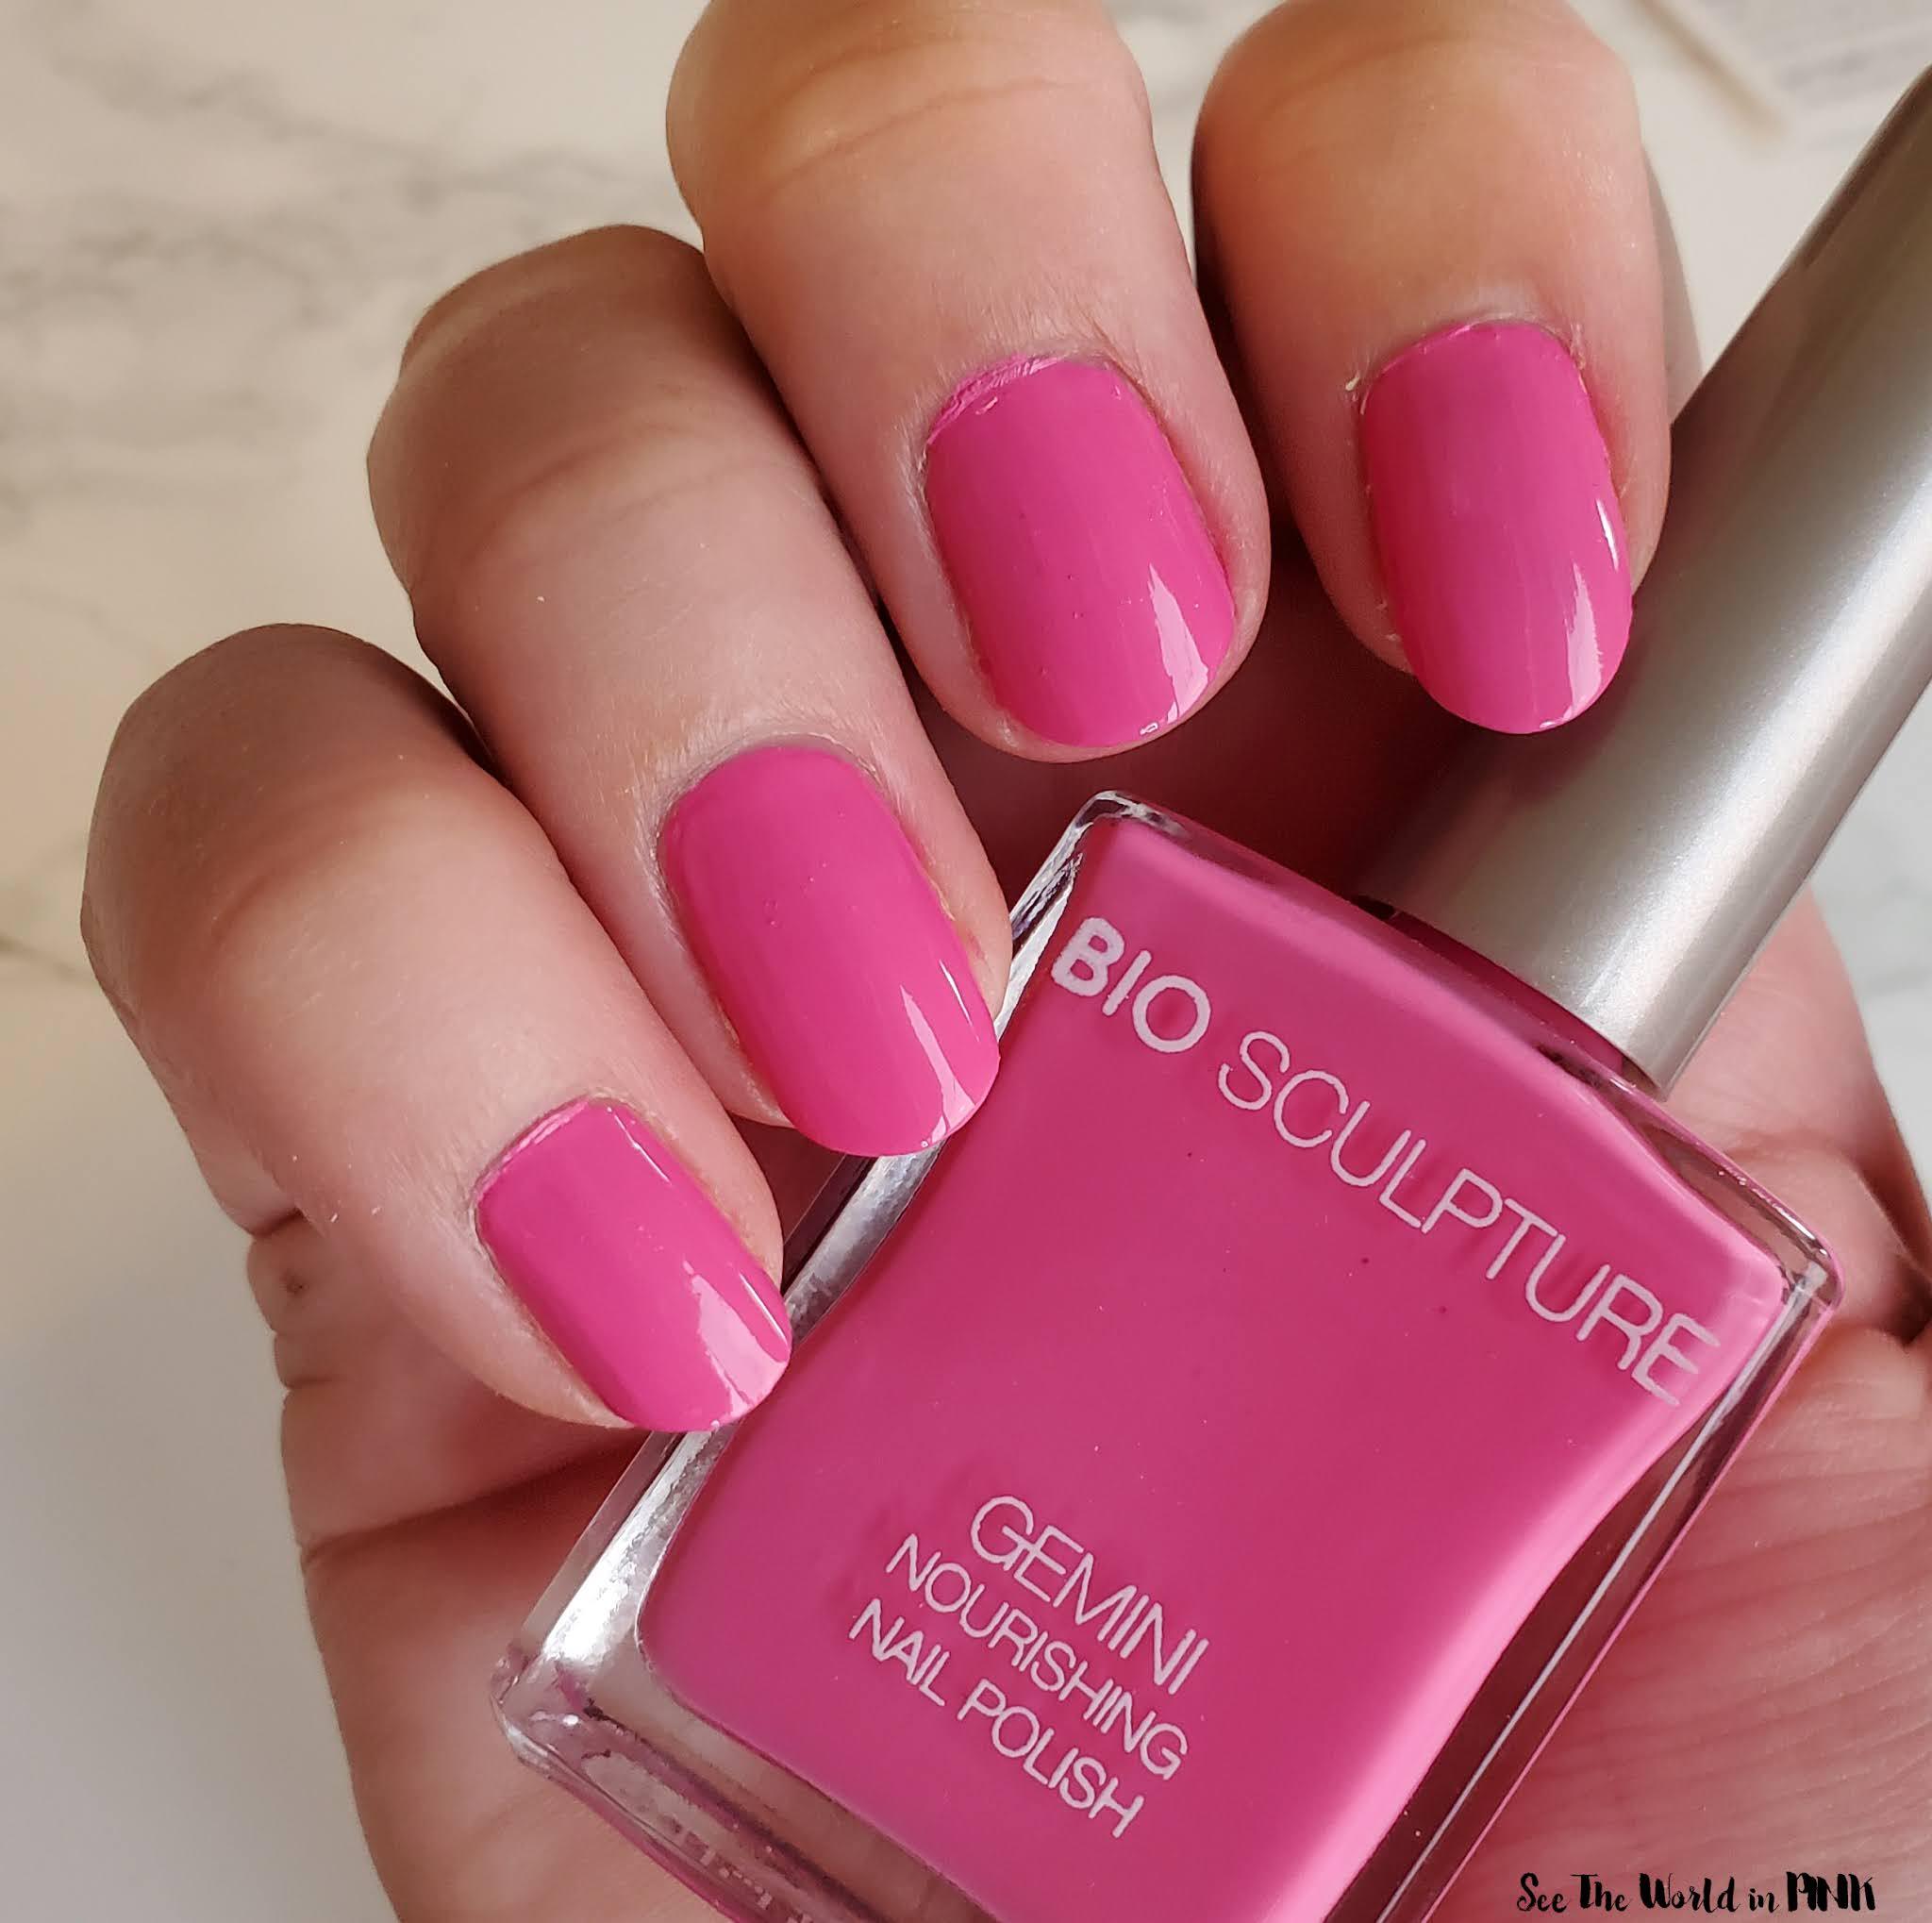 Manicure Monday - Bio Sculpture Perfect Pink Polish